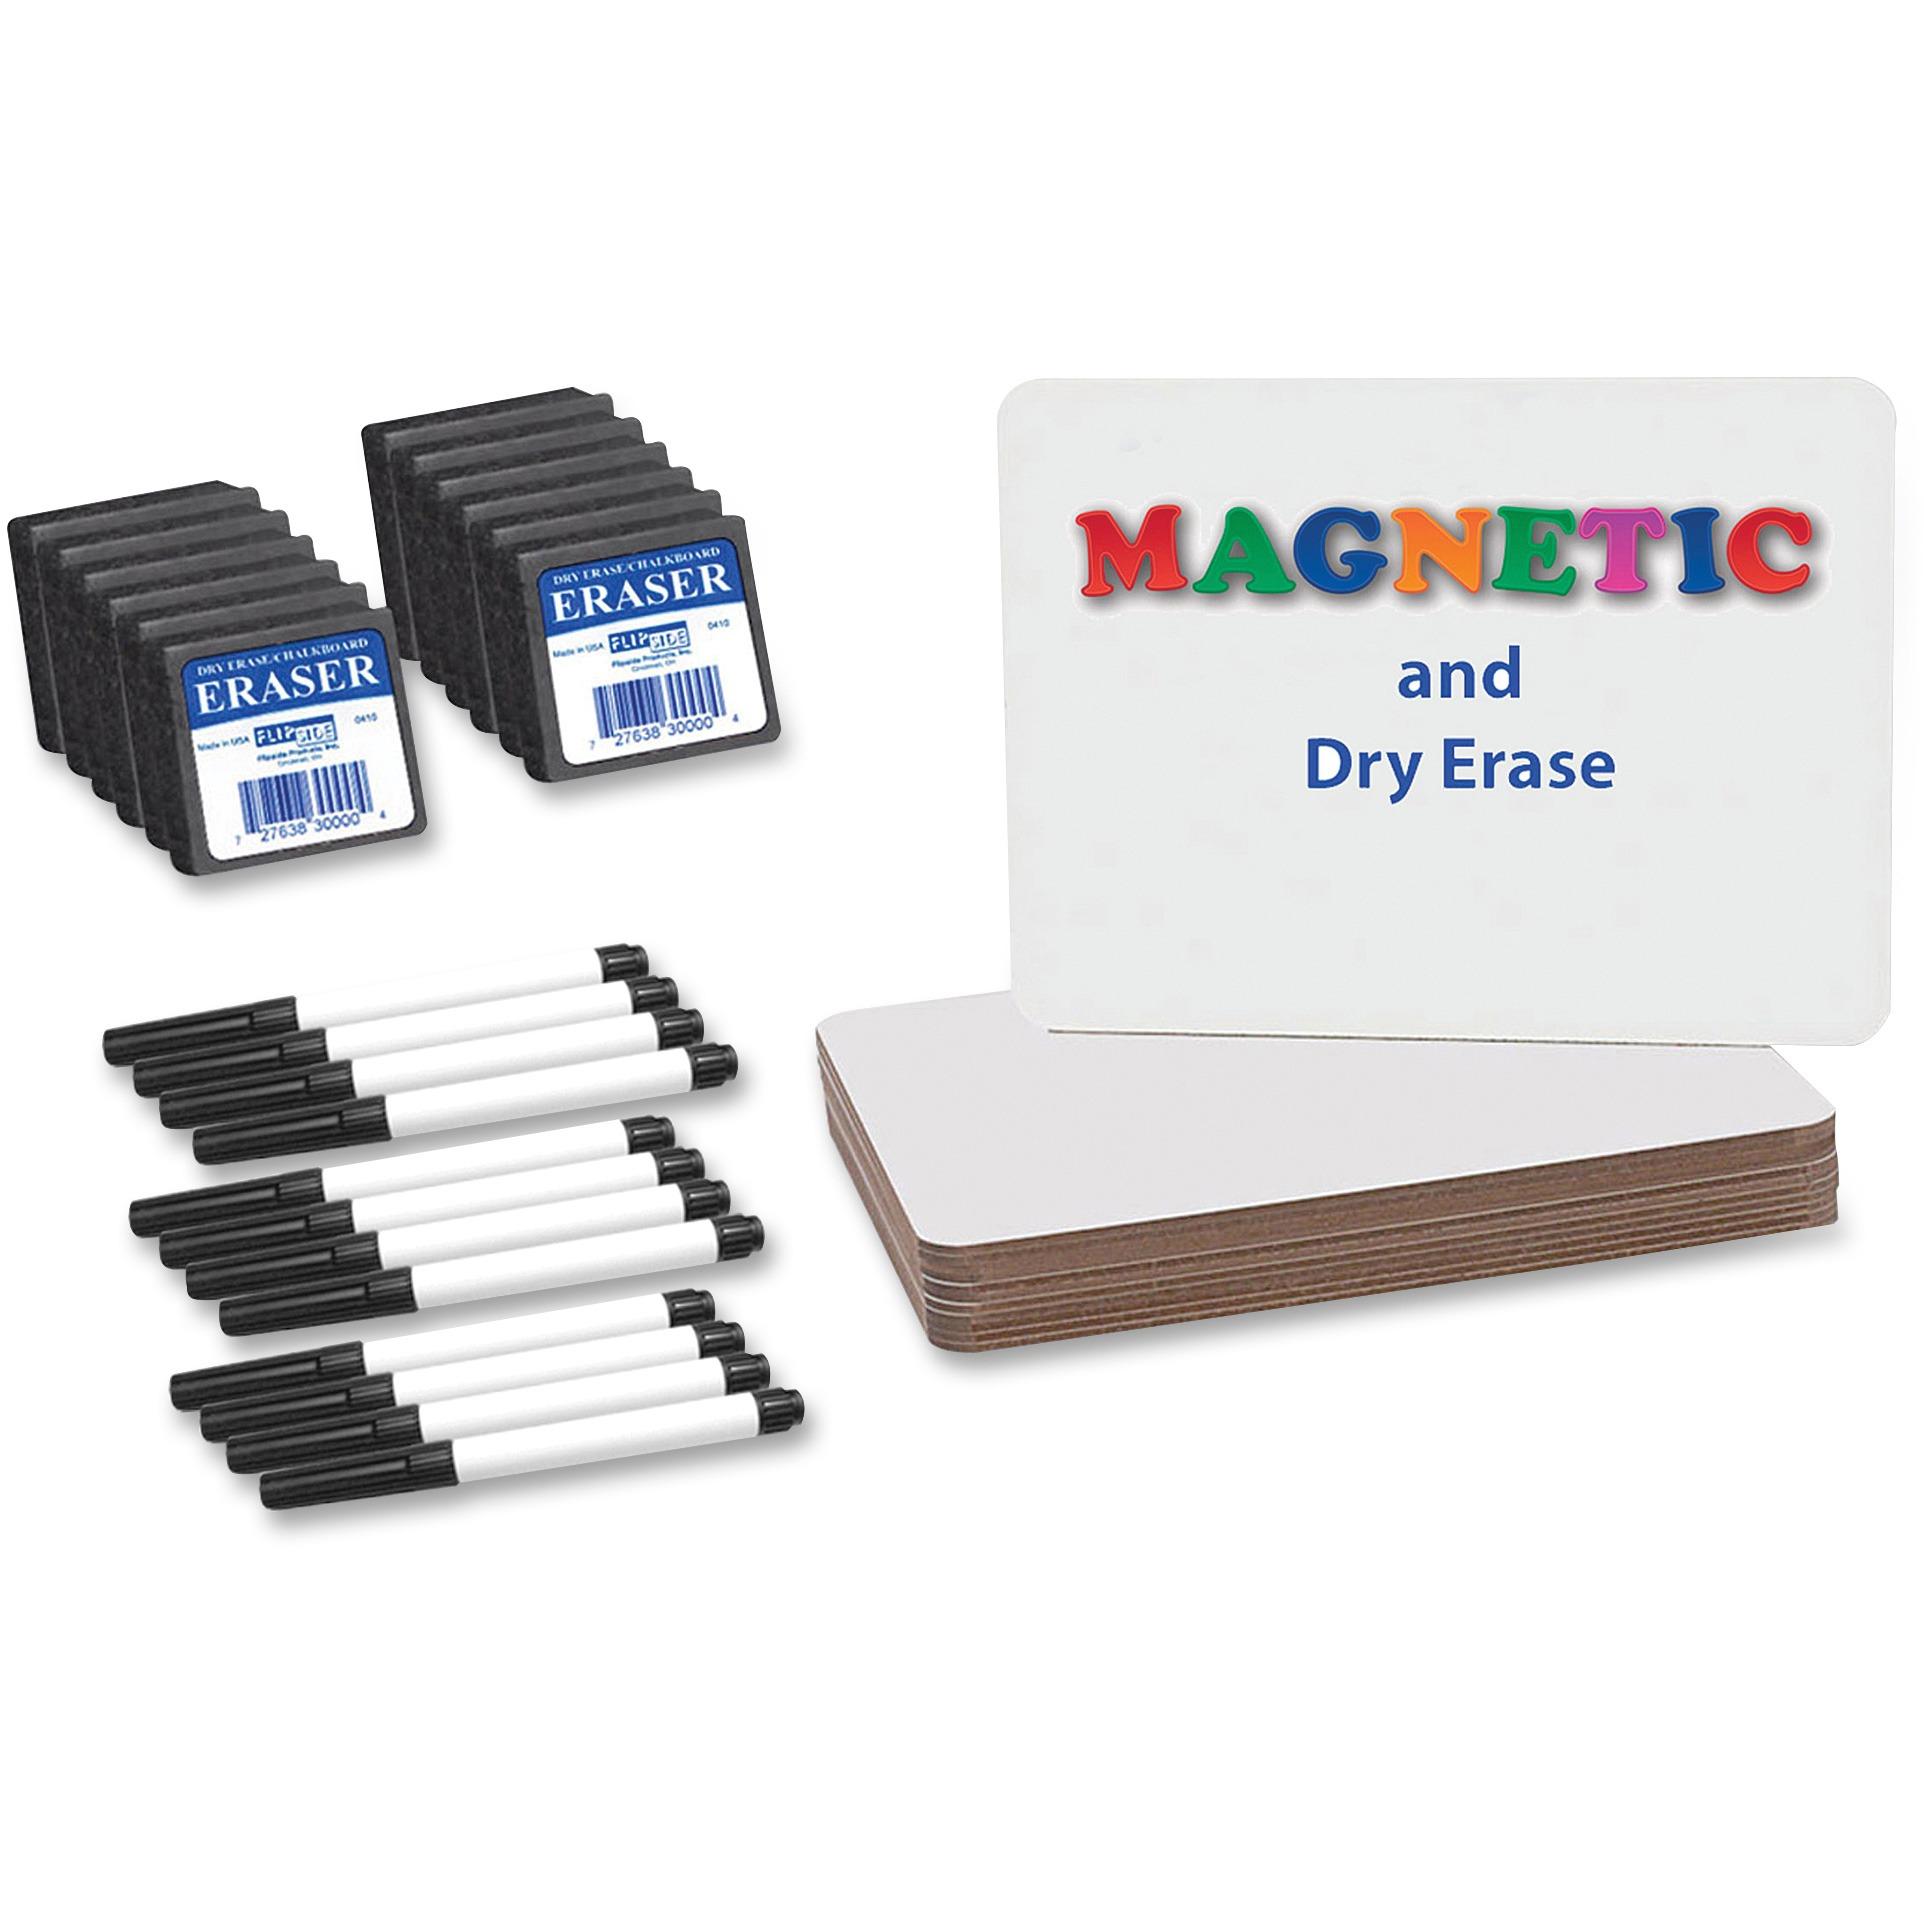 Flipside, FLP21004, Magnetic Dry Erase Board Set Class Pack, 12 / Pack